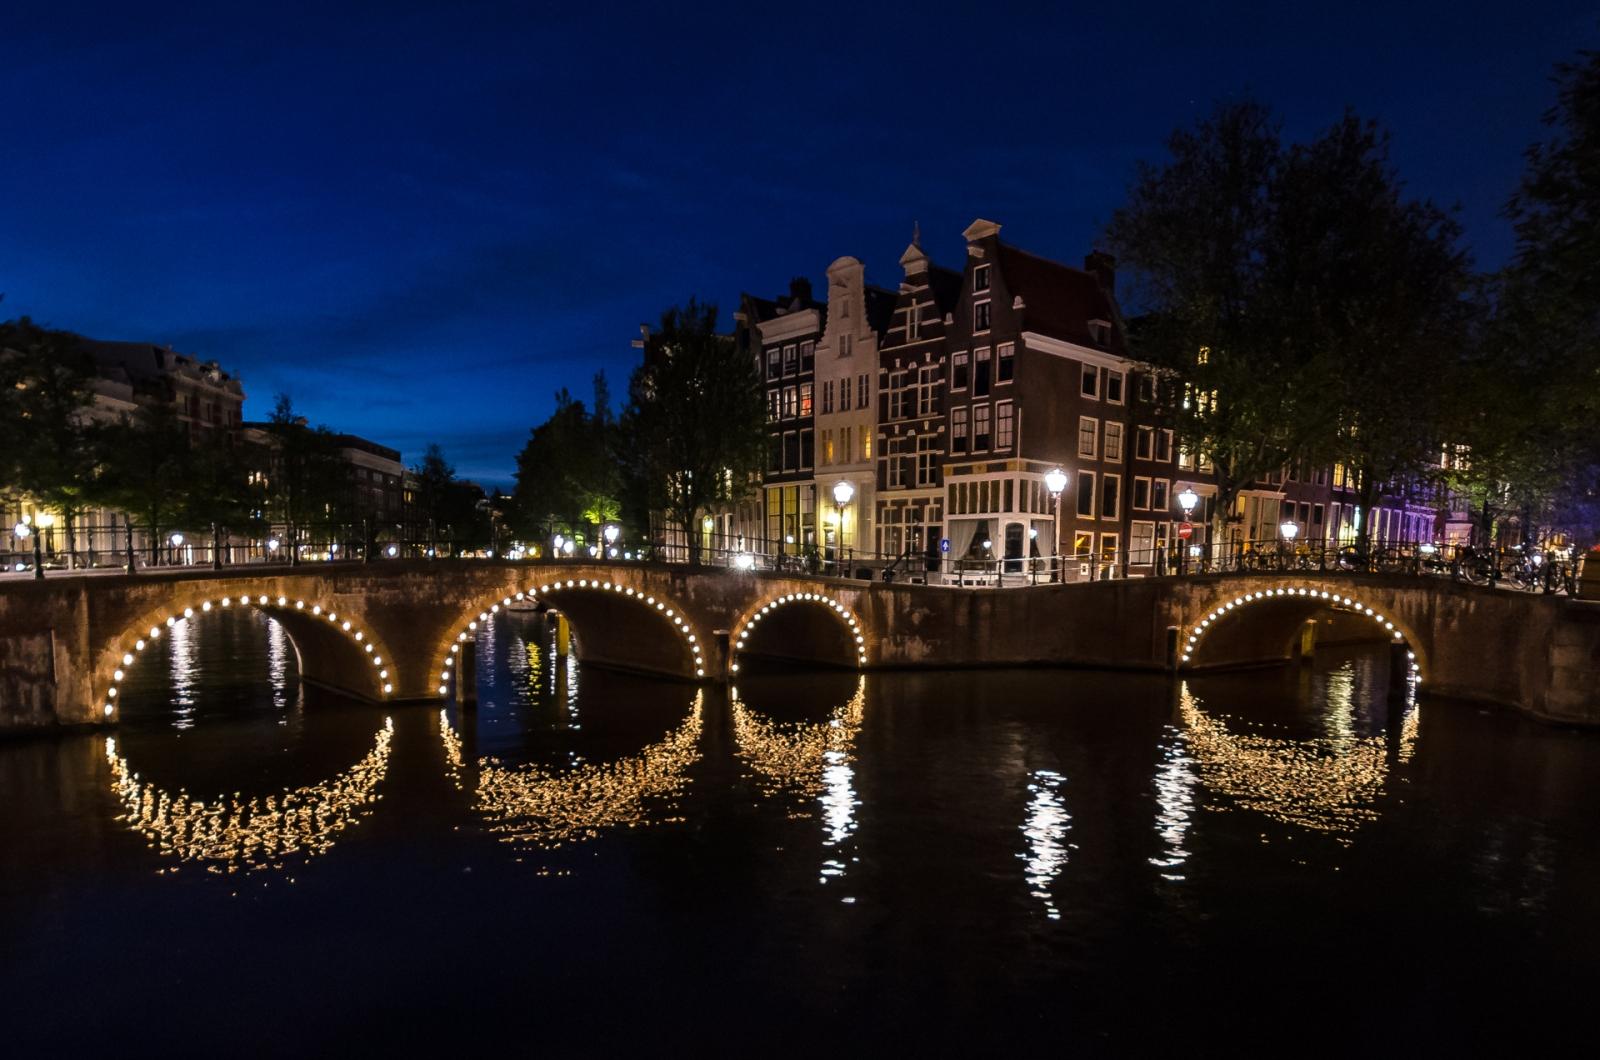 Nordseetour_Amsterdam_DHK6248